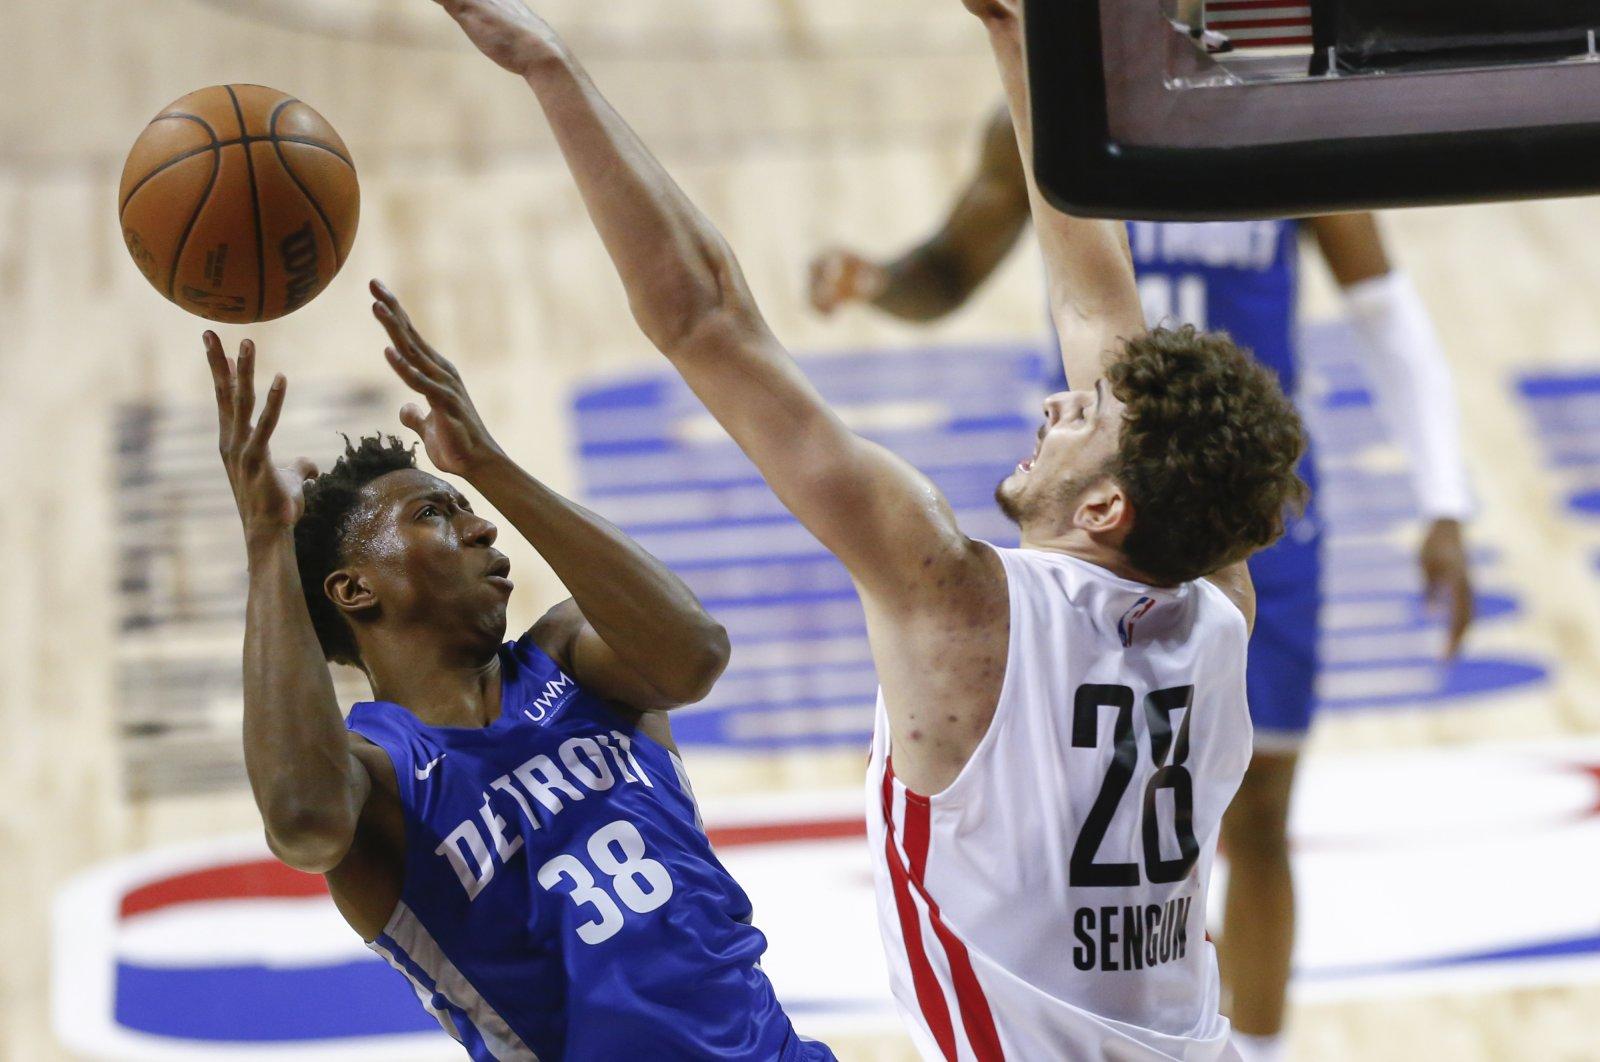 Houston Rockets' Alperen Şengün (R) defends against Detroit Pistons' Saben Lee during an NBA Summer League match, in Las Vegas, U.S., Aug. 10, 2021. (AP Photo)